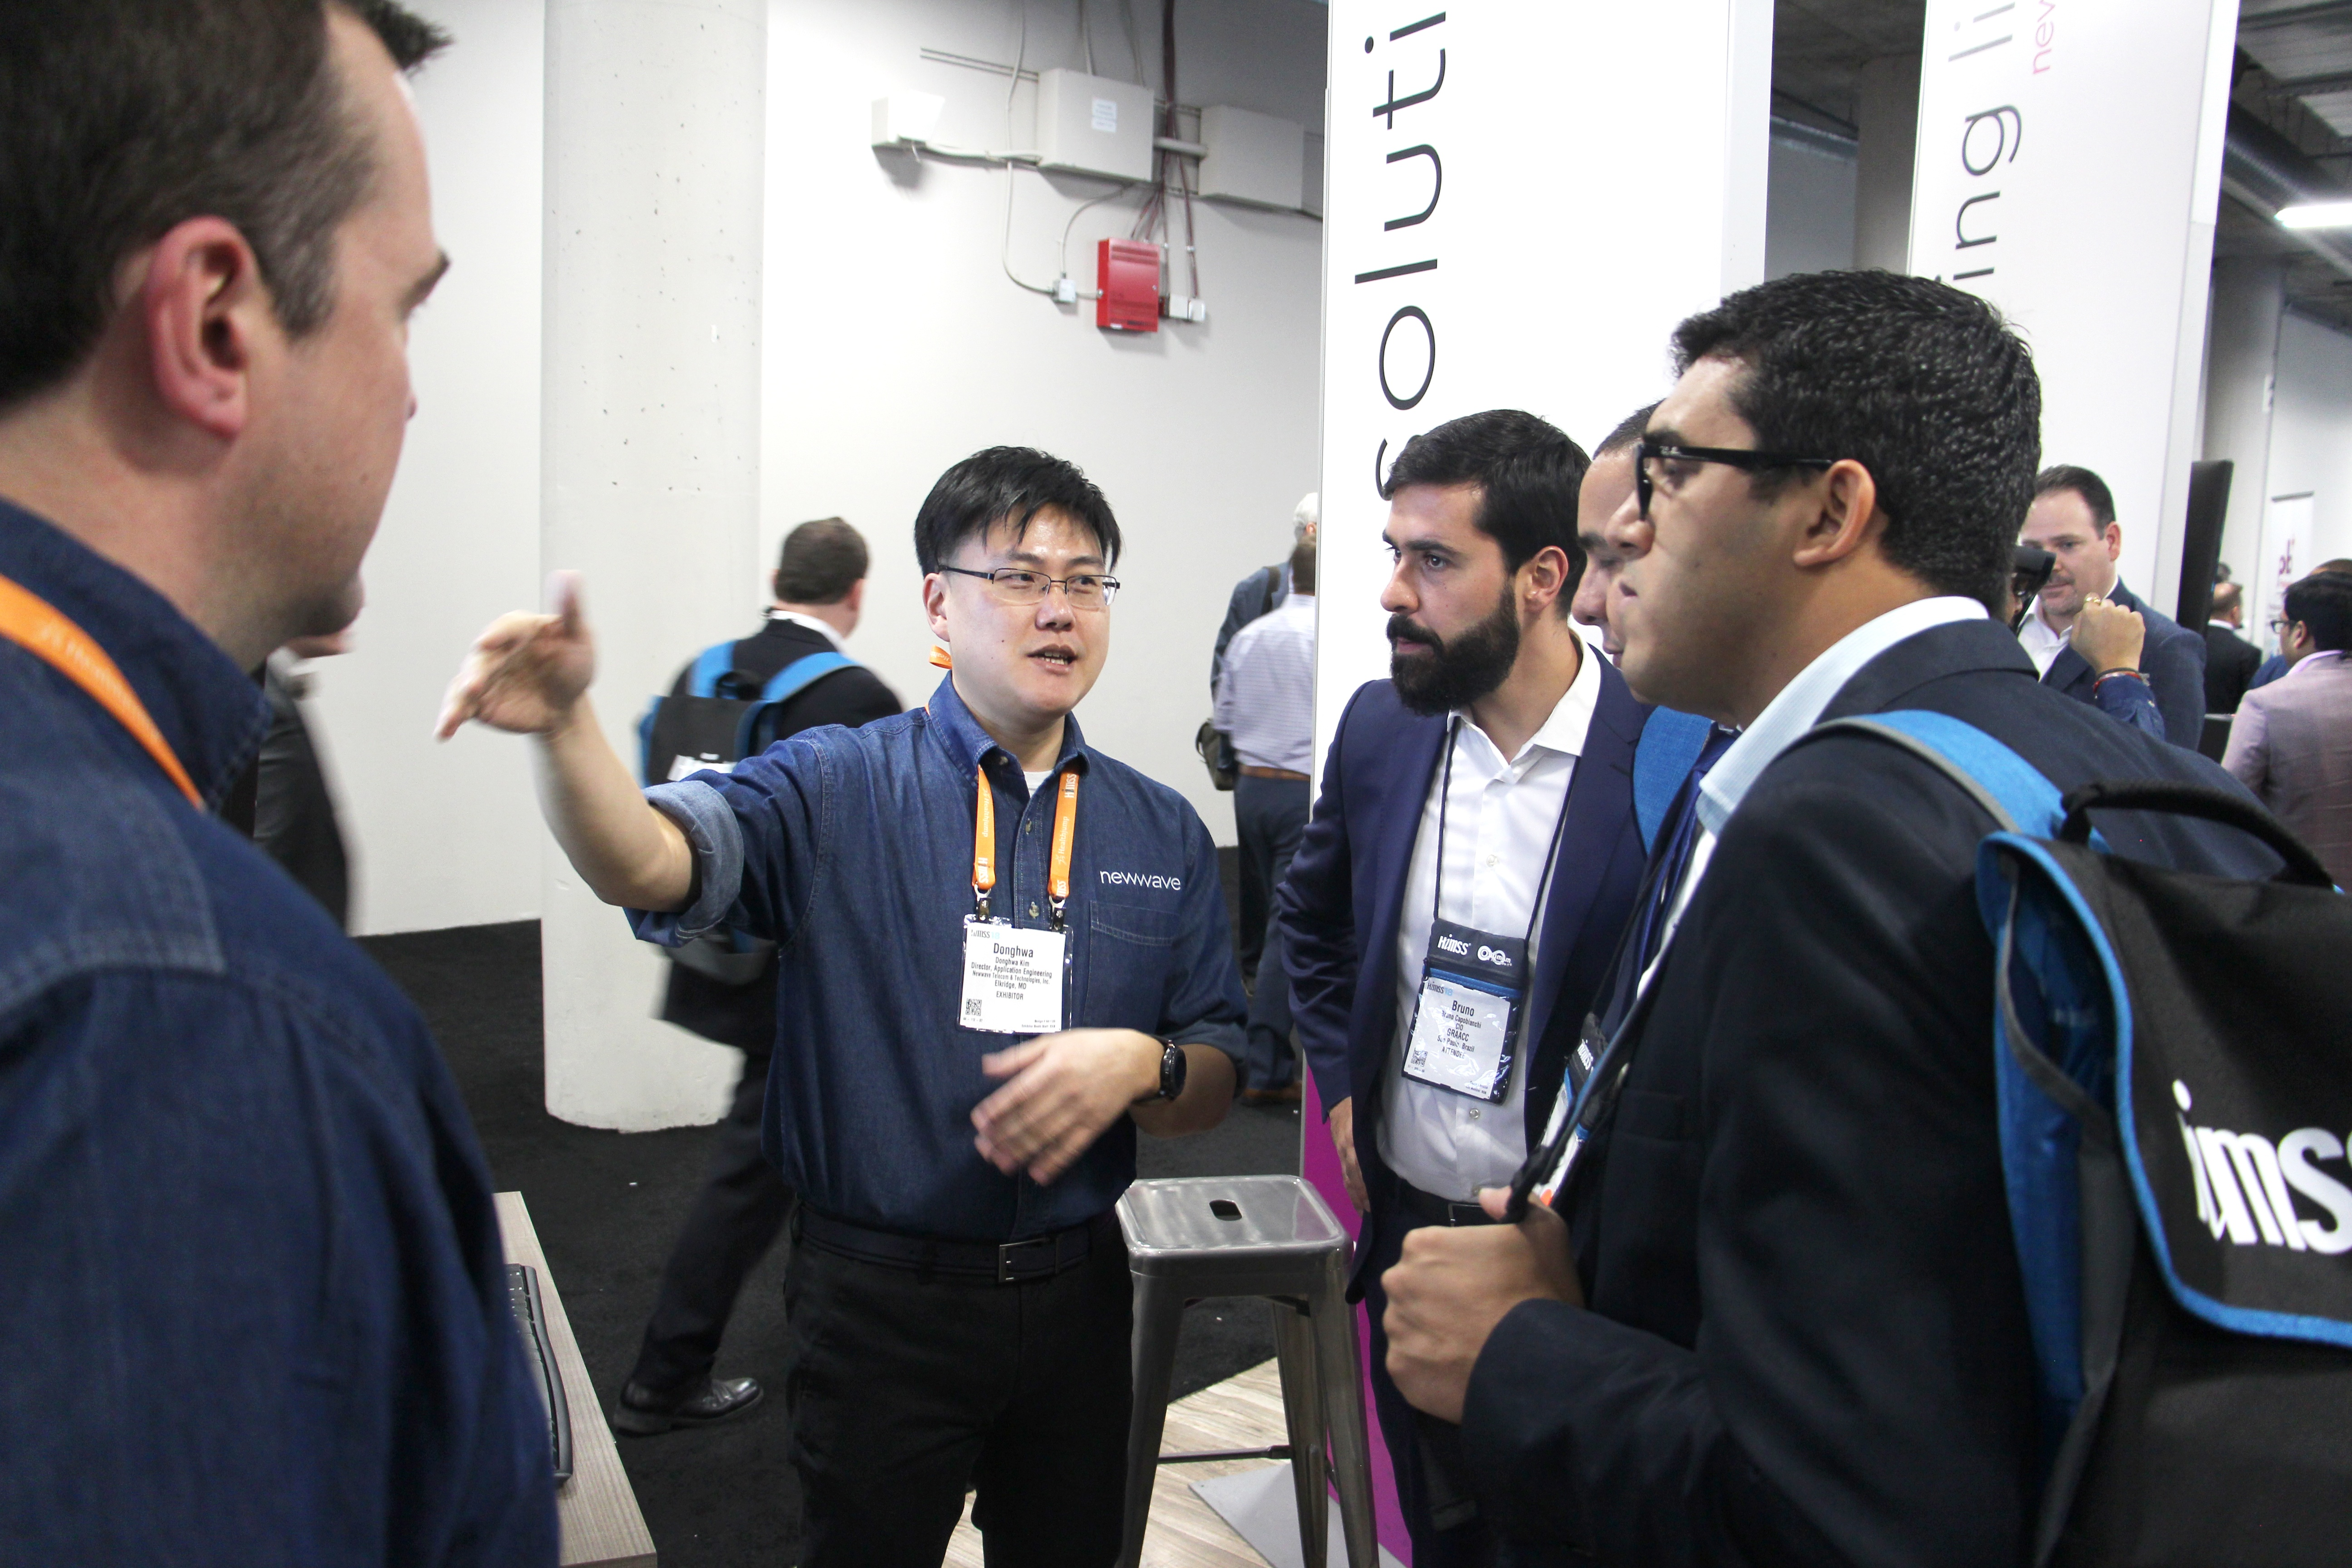 John Kim showcases big data demo to audience